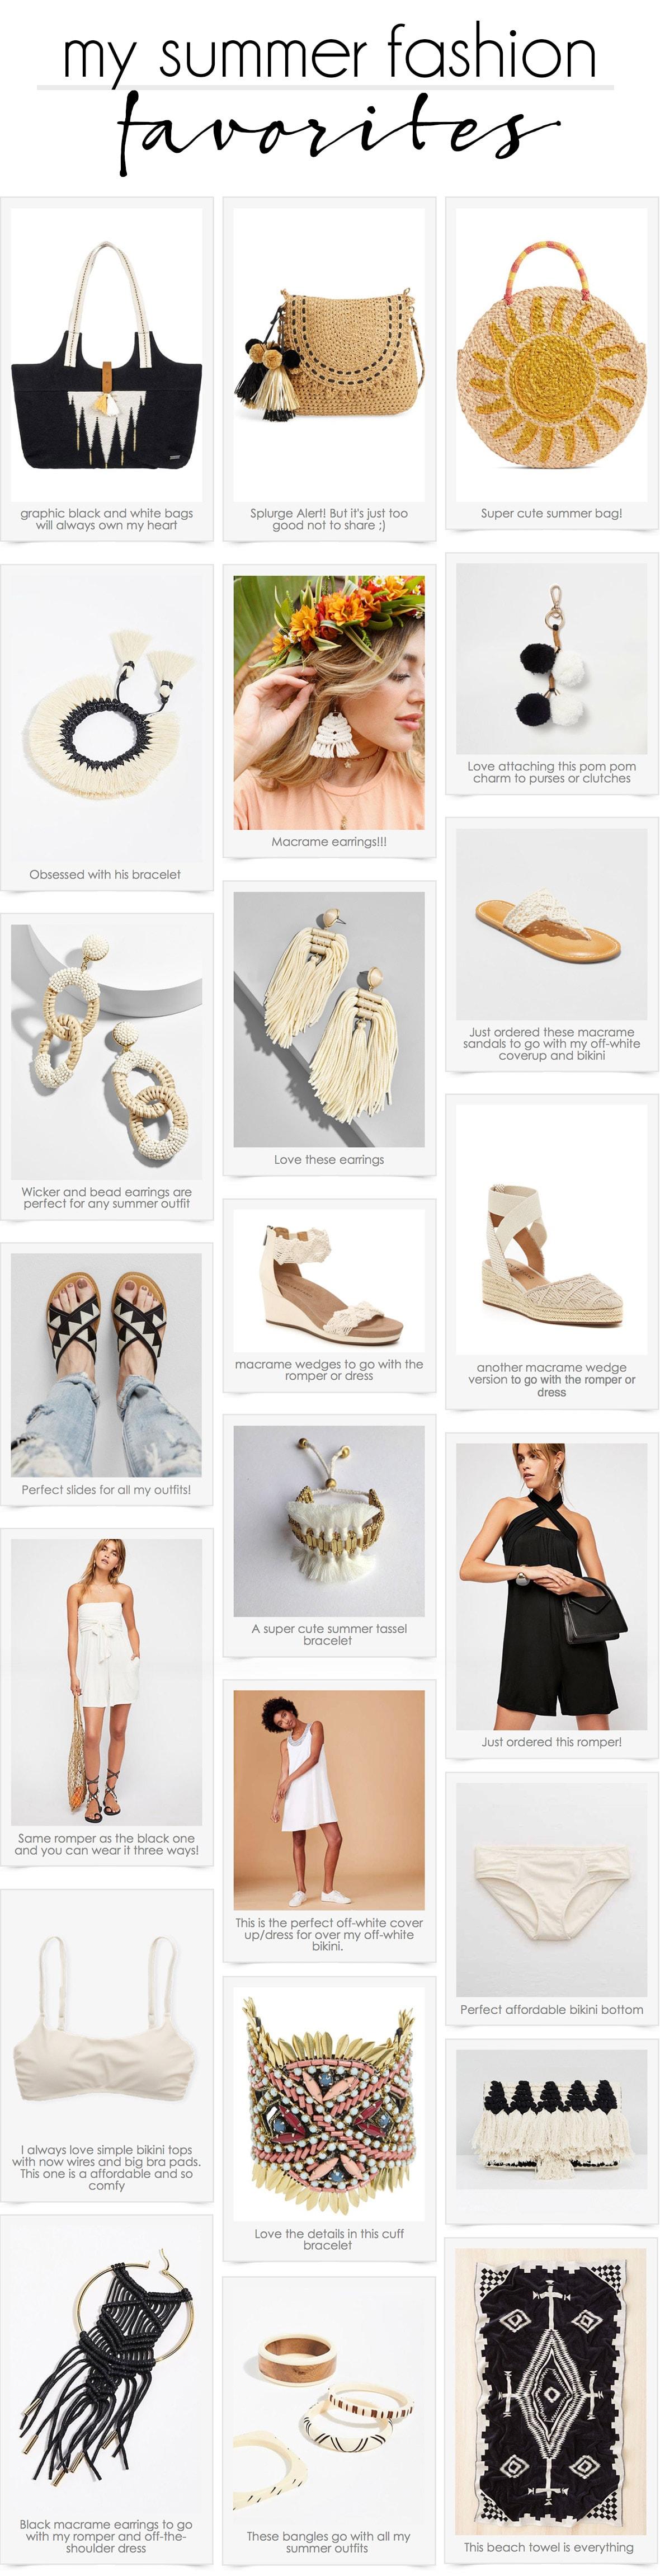 summer fashion favorites | summer handbags | summer jewelry | macrame flip flops | macrame wedges | black and white fashion #fashion #summerfashion